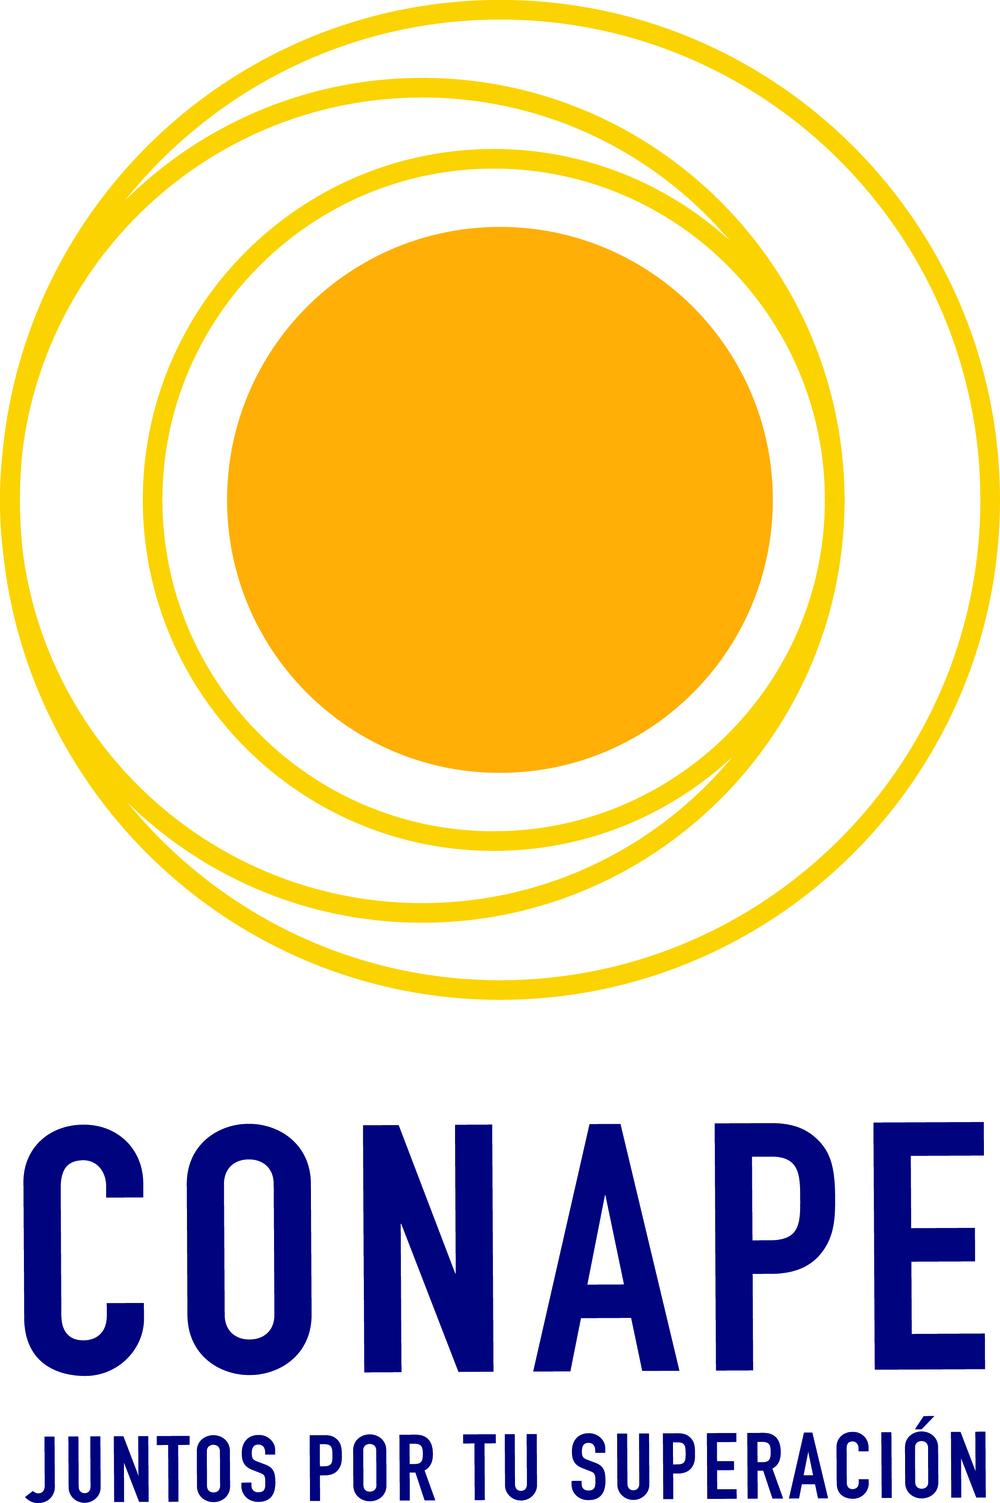 Conape.jpg